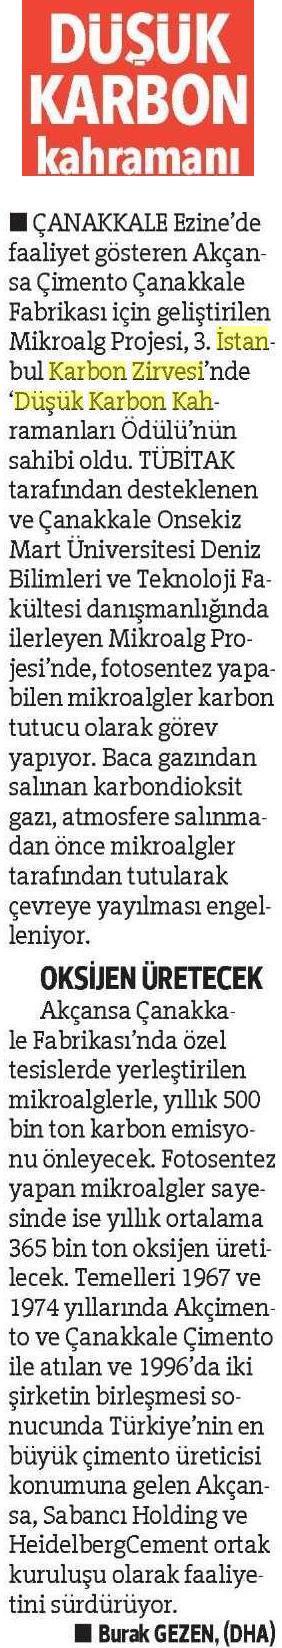 İzmir Hürriyet Şehir 28.04.2016